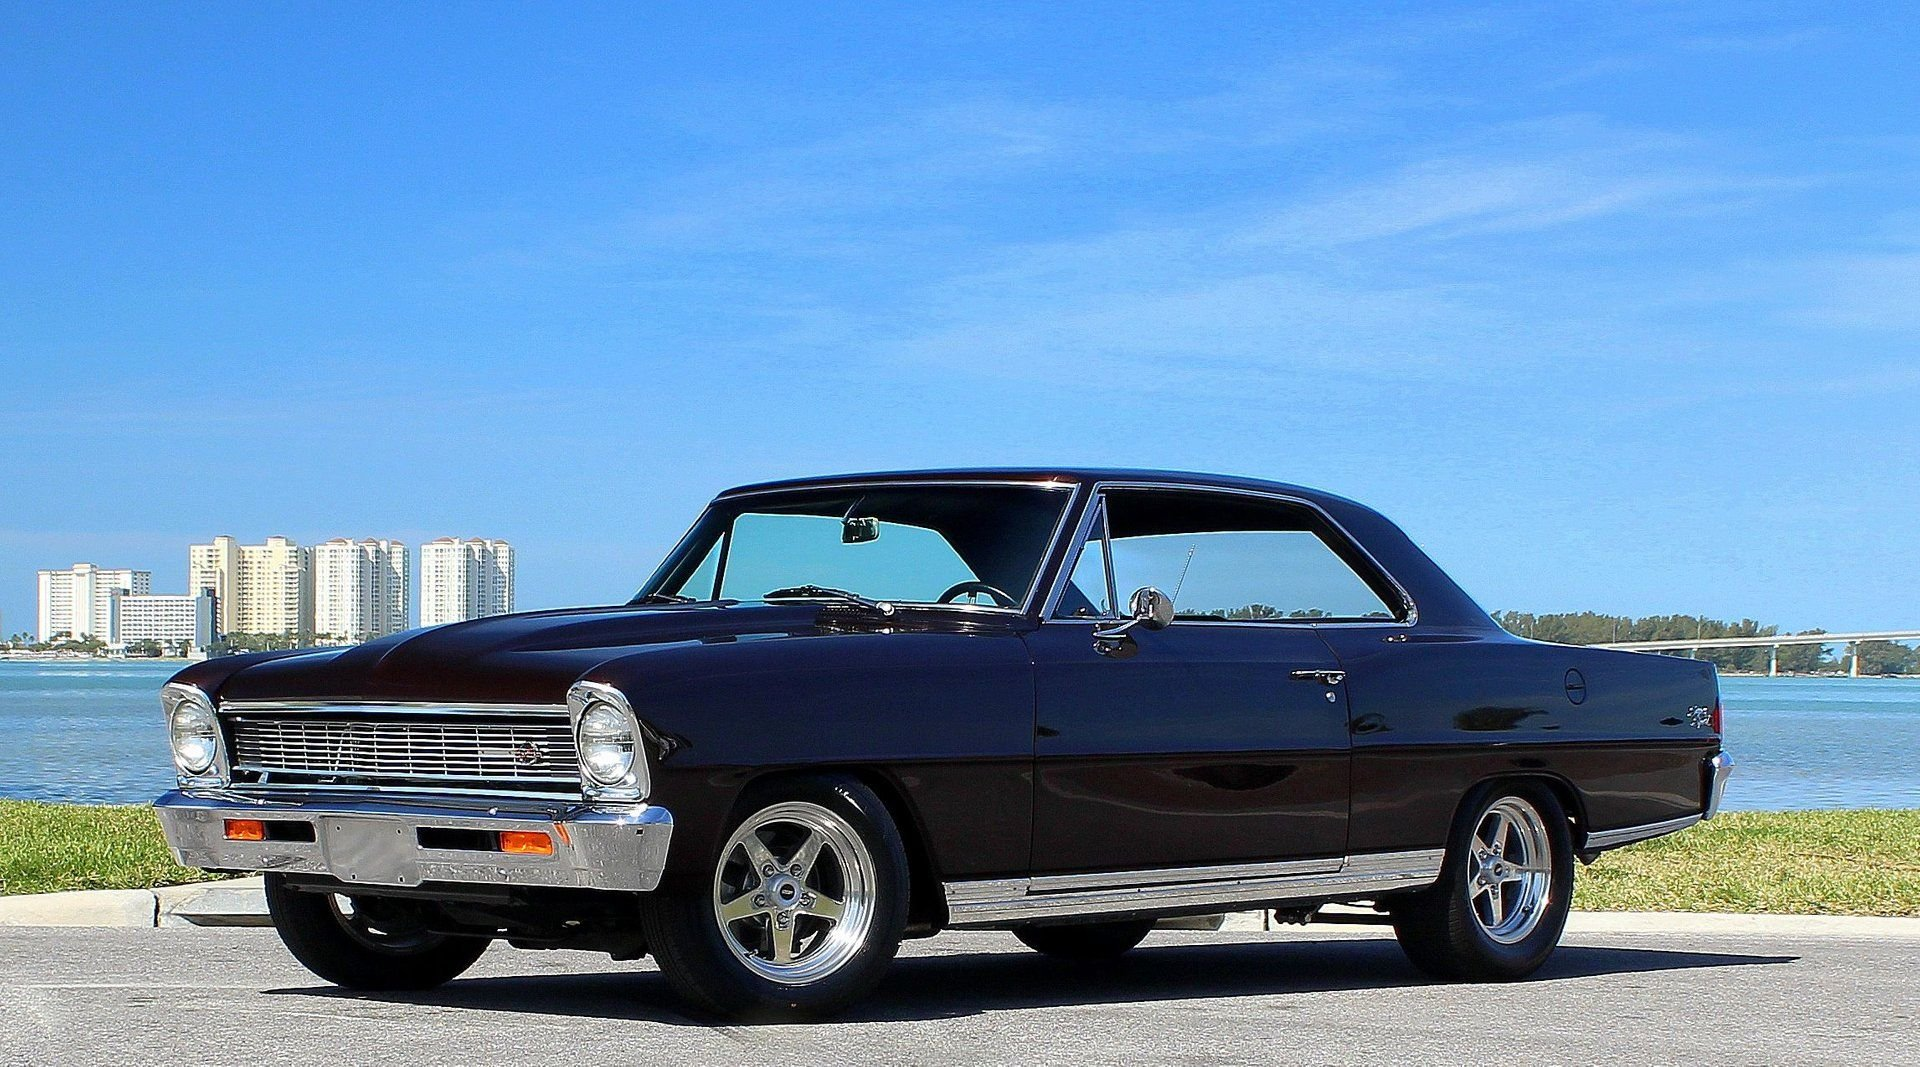 1966 chevrolet nova ss coupe